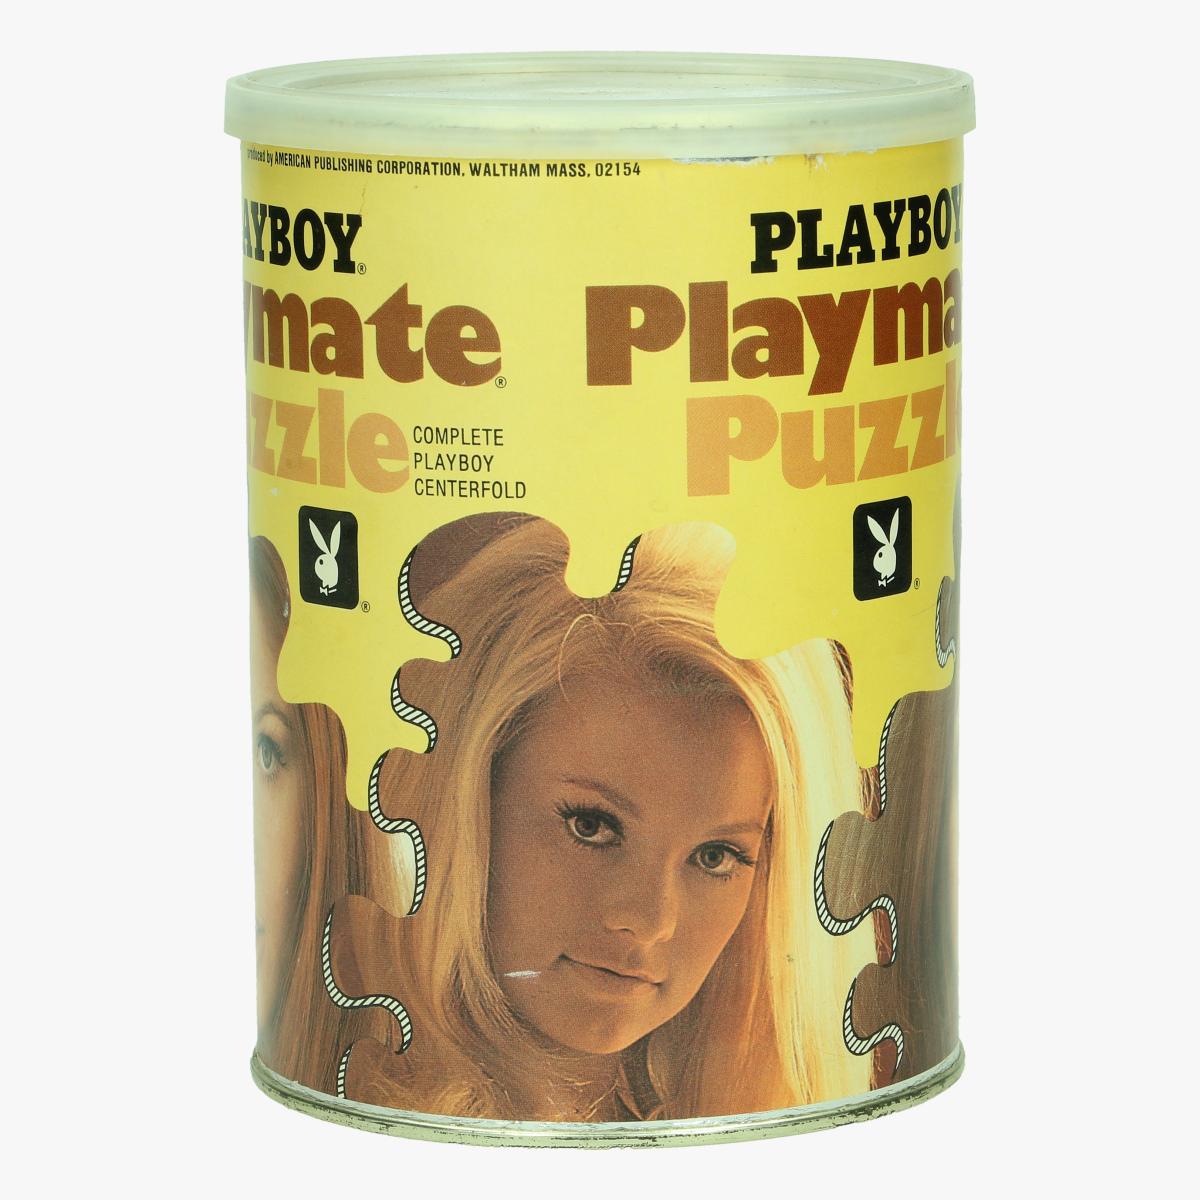 Afbeeldingen van vintage playboy puzzel mis march bonnie large jaren 70' produced by american publishing corporation .waltham mass